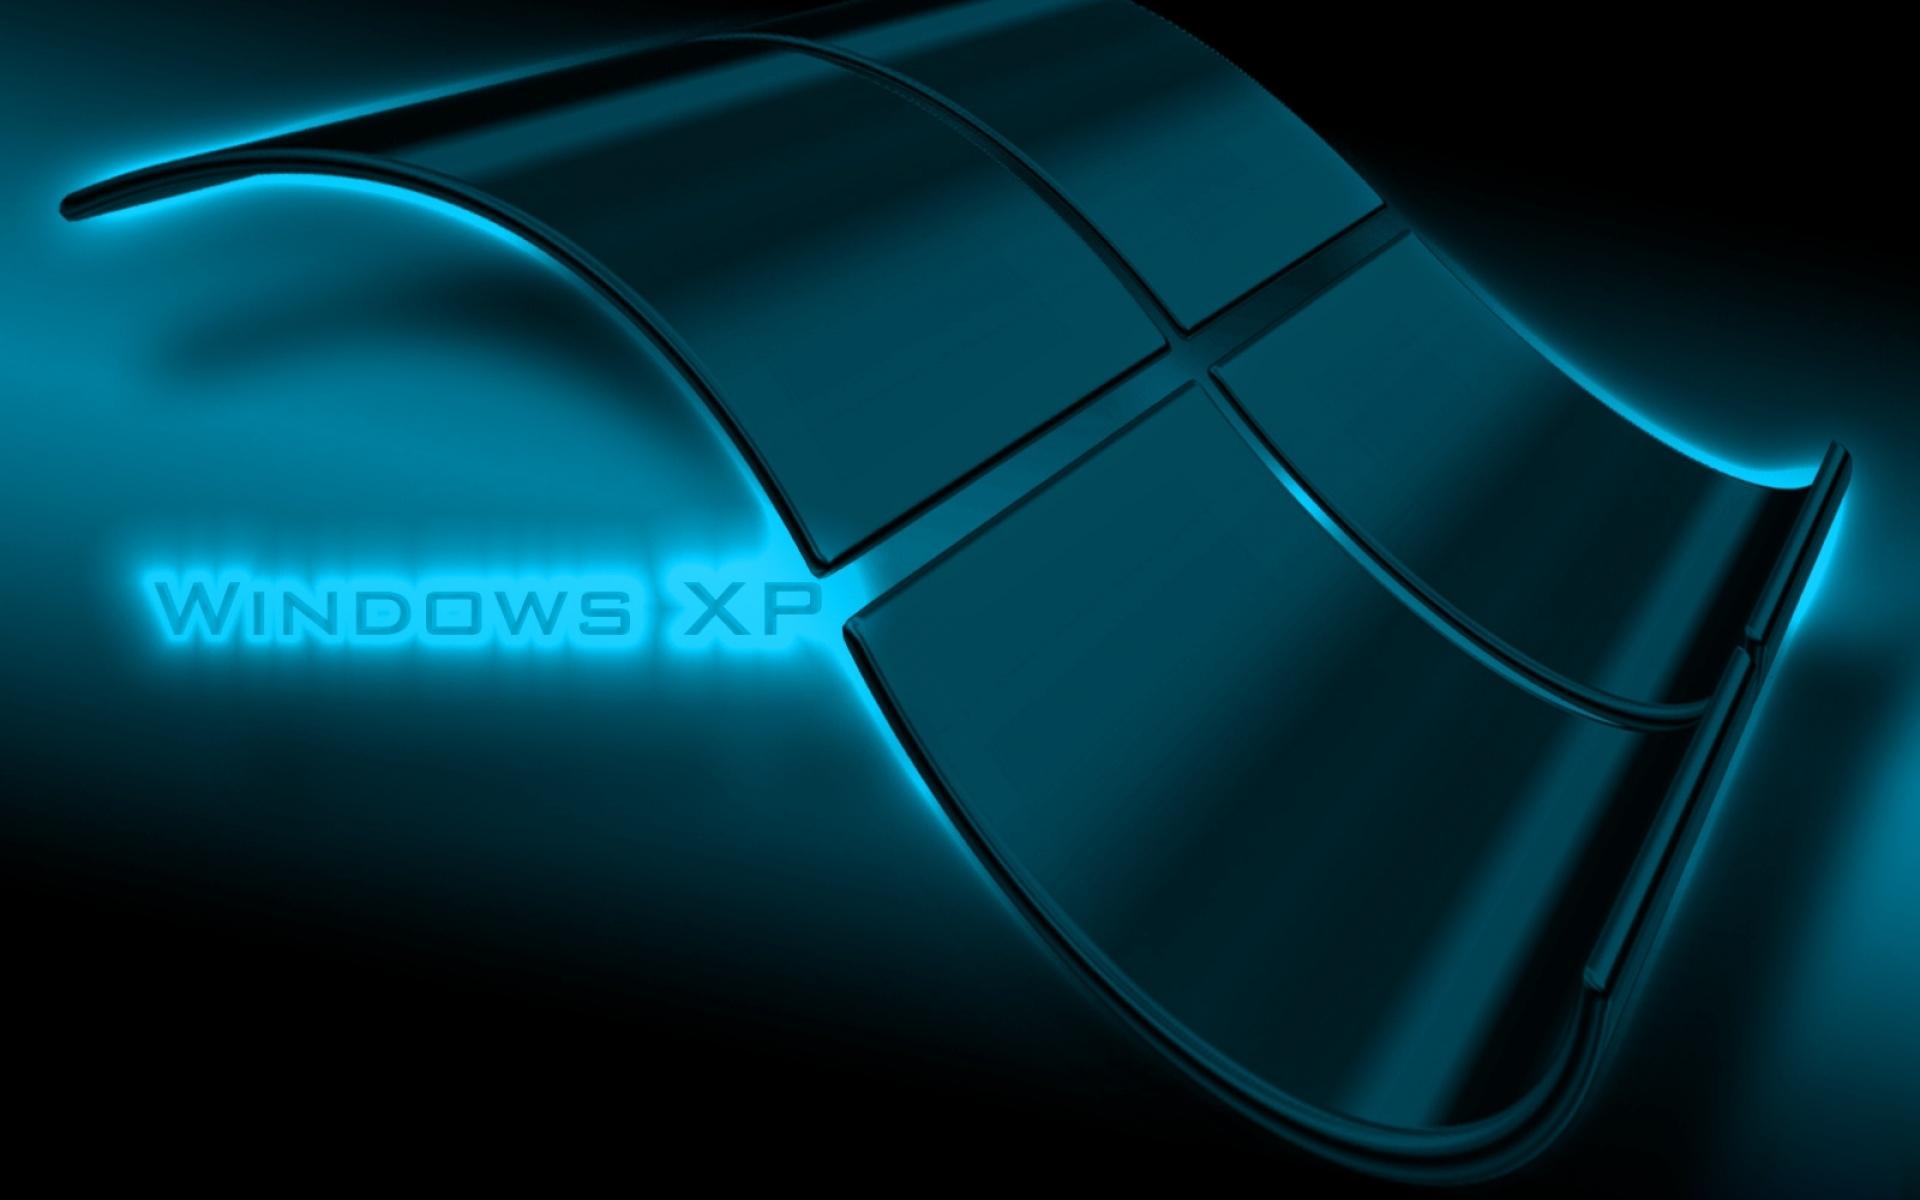 Картинки Windows xp, система, стекло, фон, тень фото и обои на рабочий стол